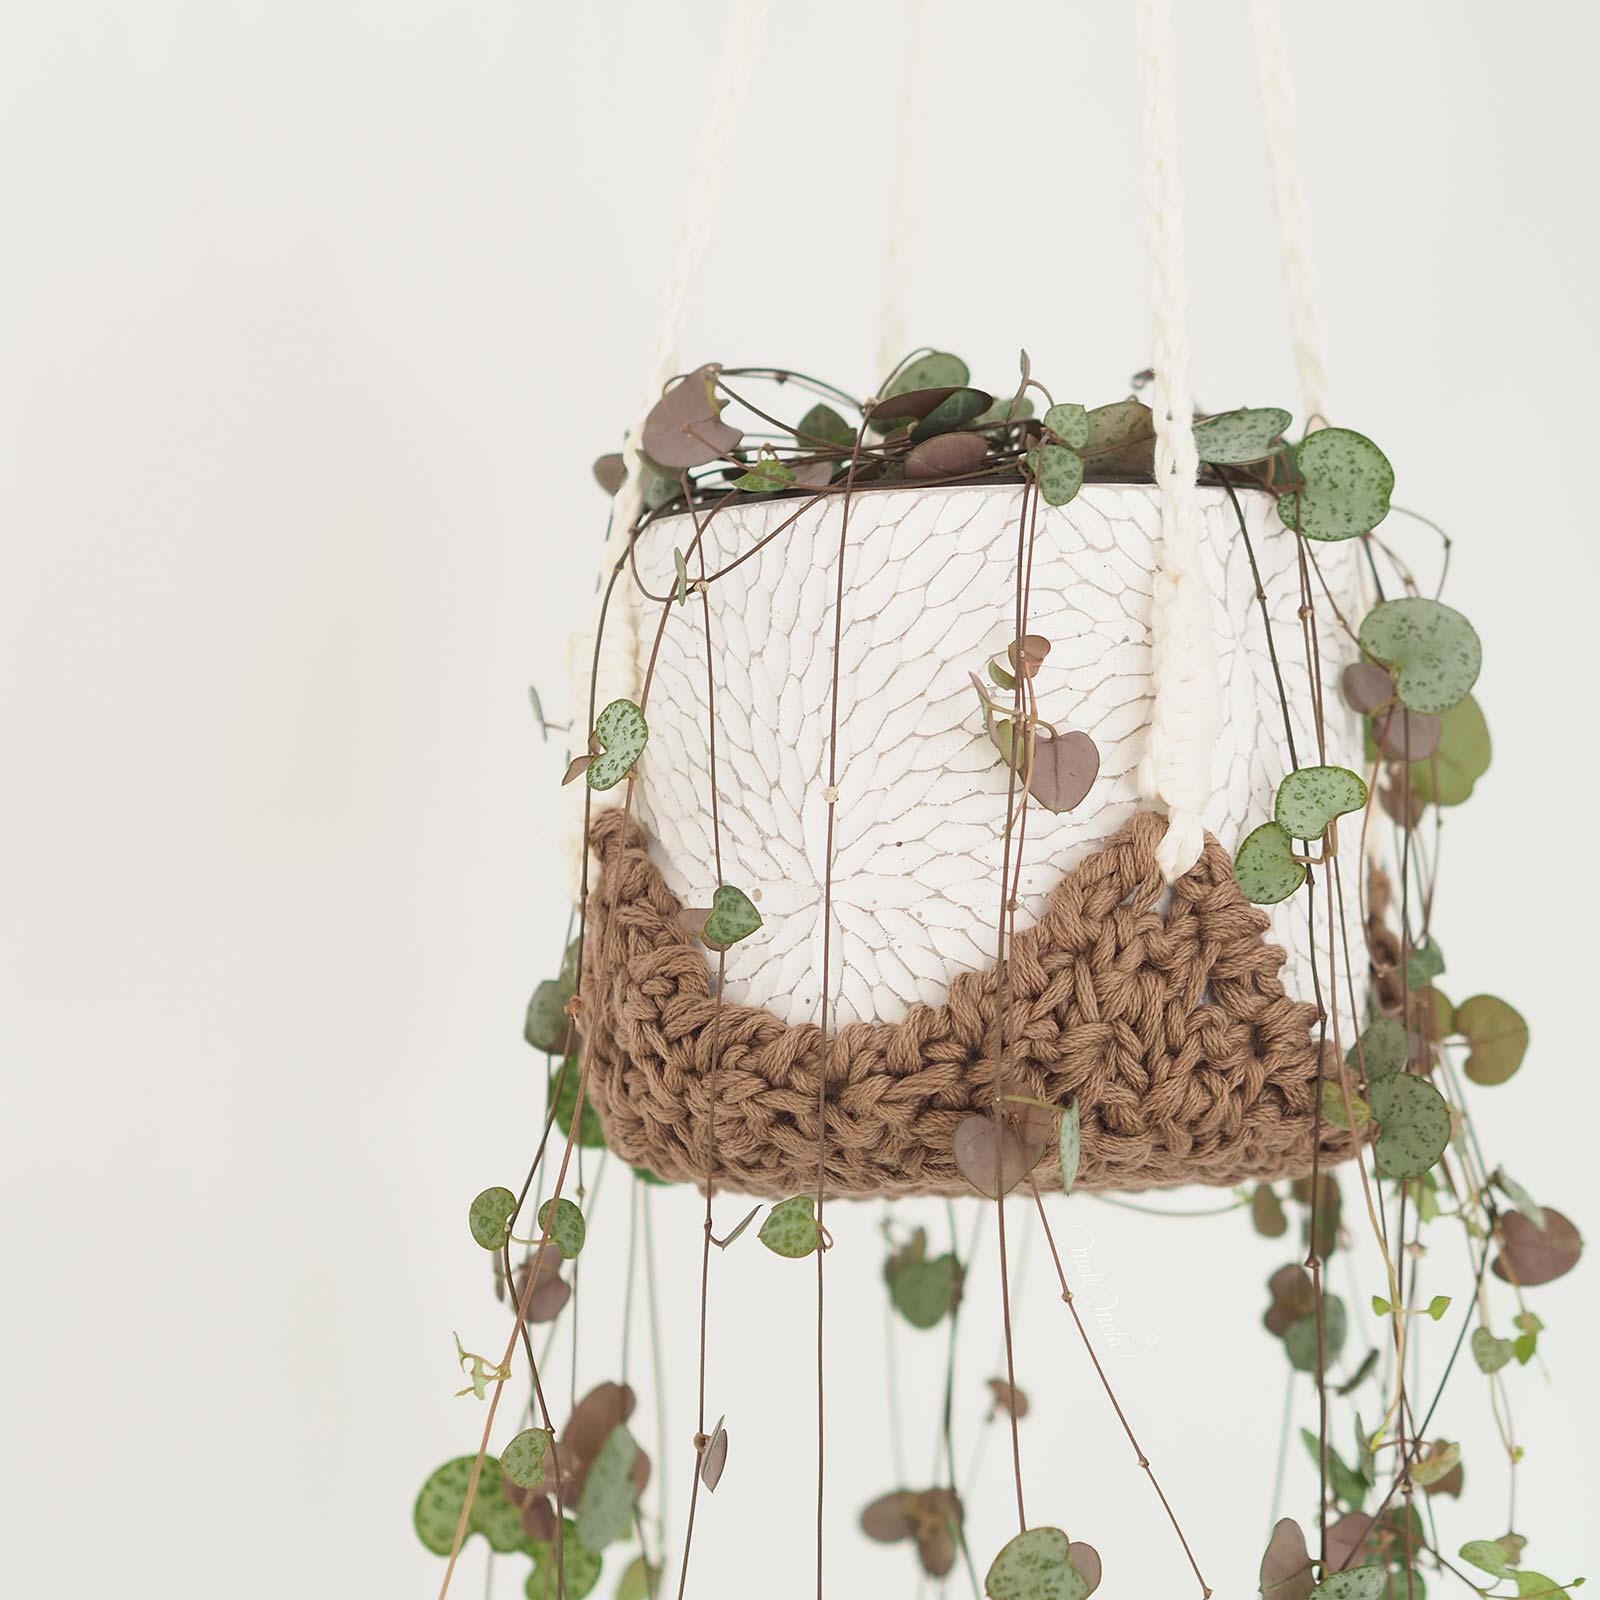 suspension-ceropegia-woodii-carre-durable-crochet-dmc-xl-natura-laboutiquedemelimelo